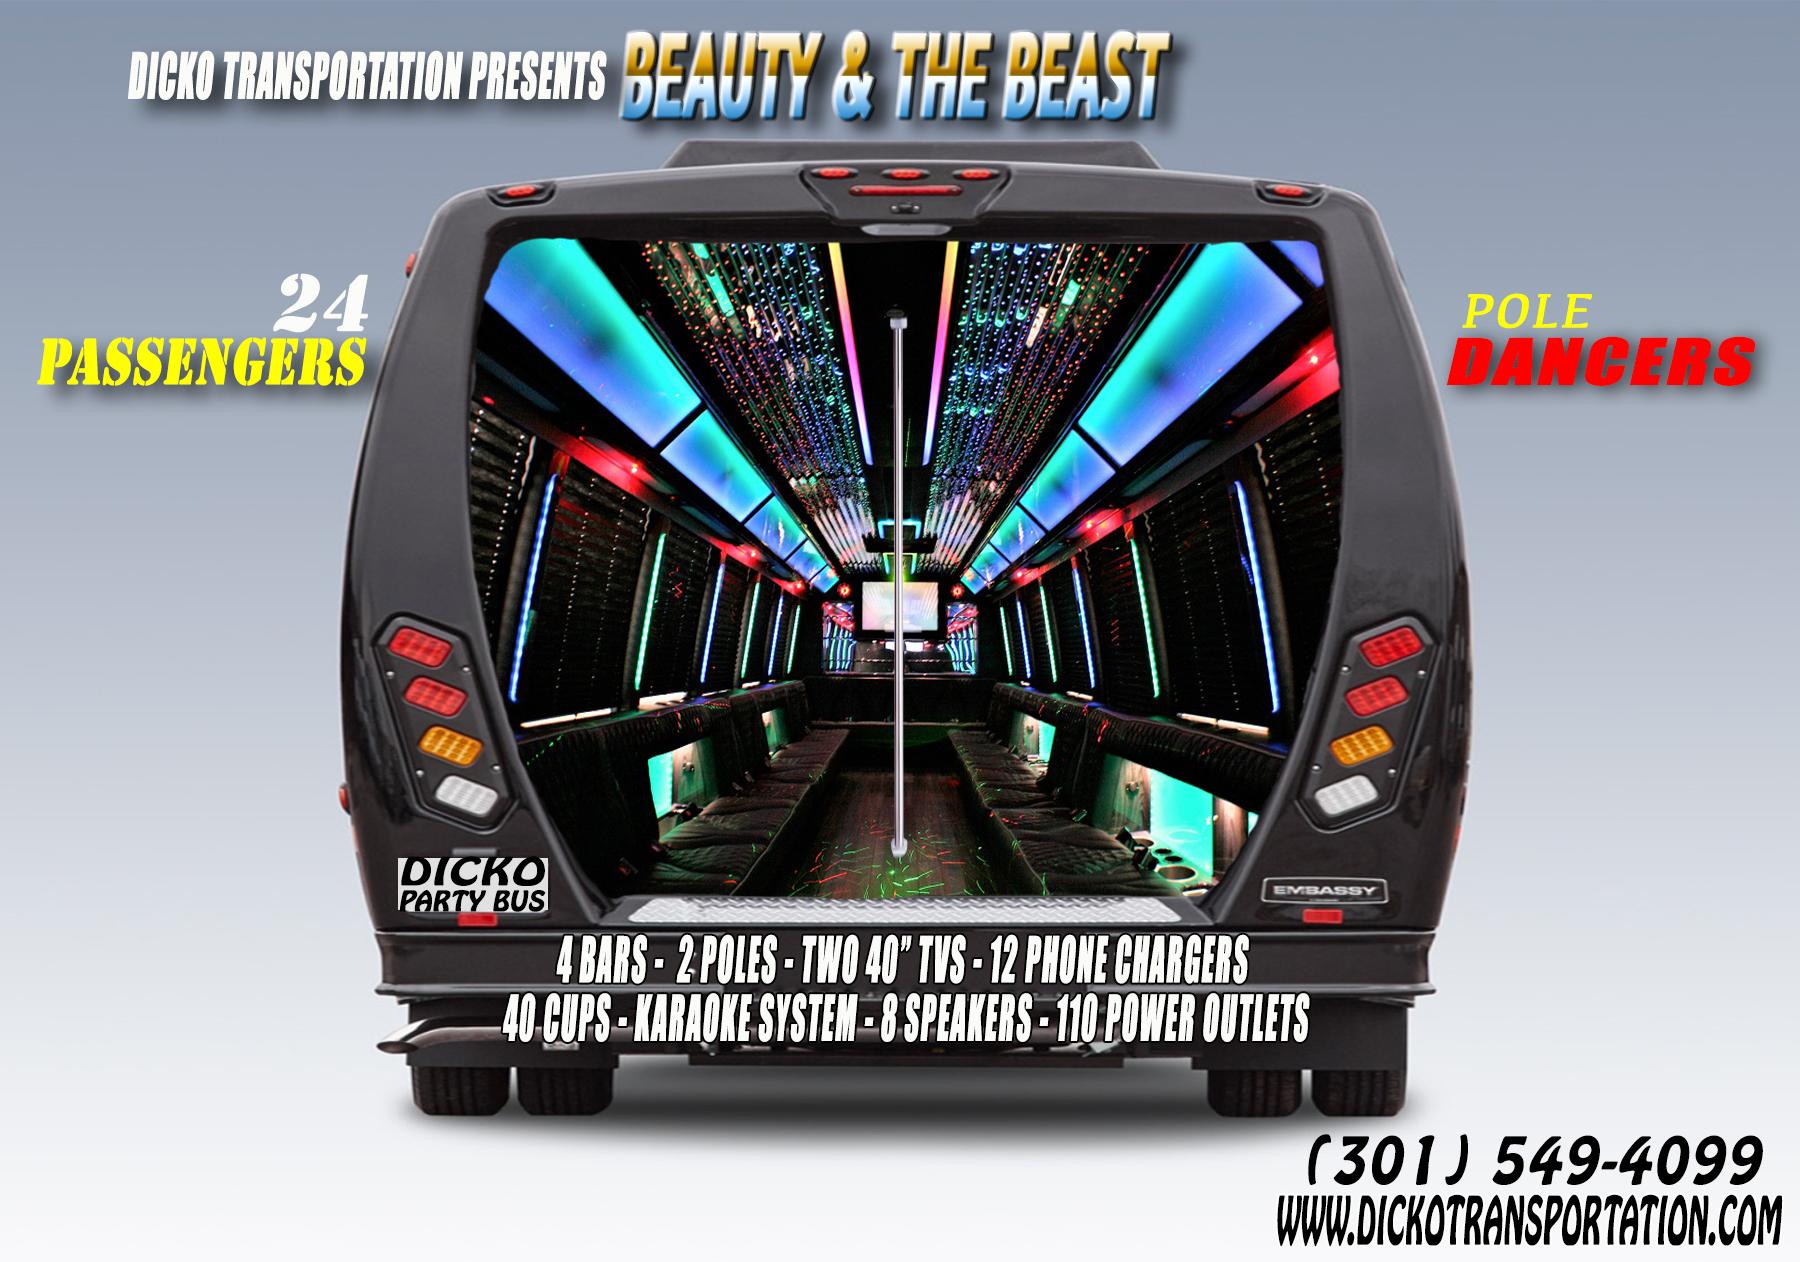 Dicko Transportation 24 Passengers party bus